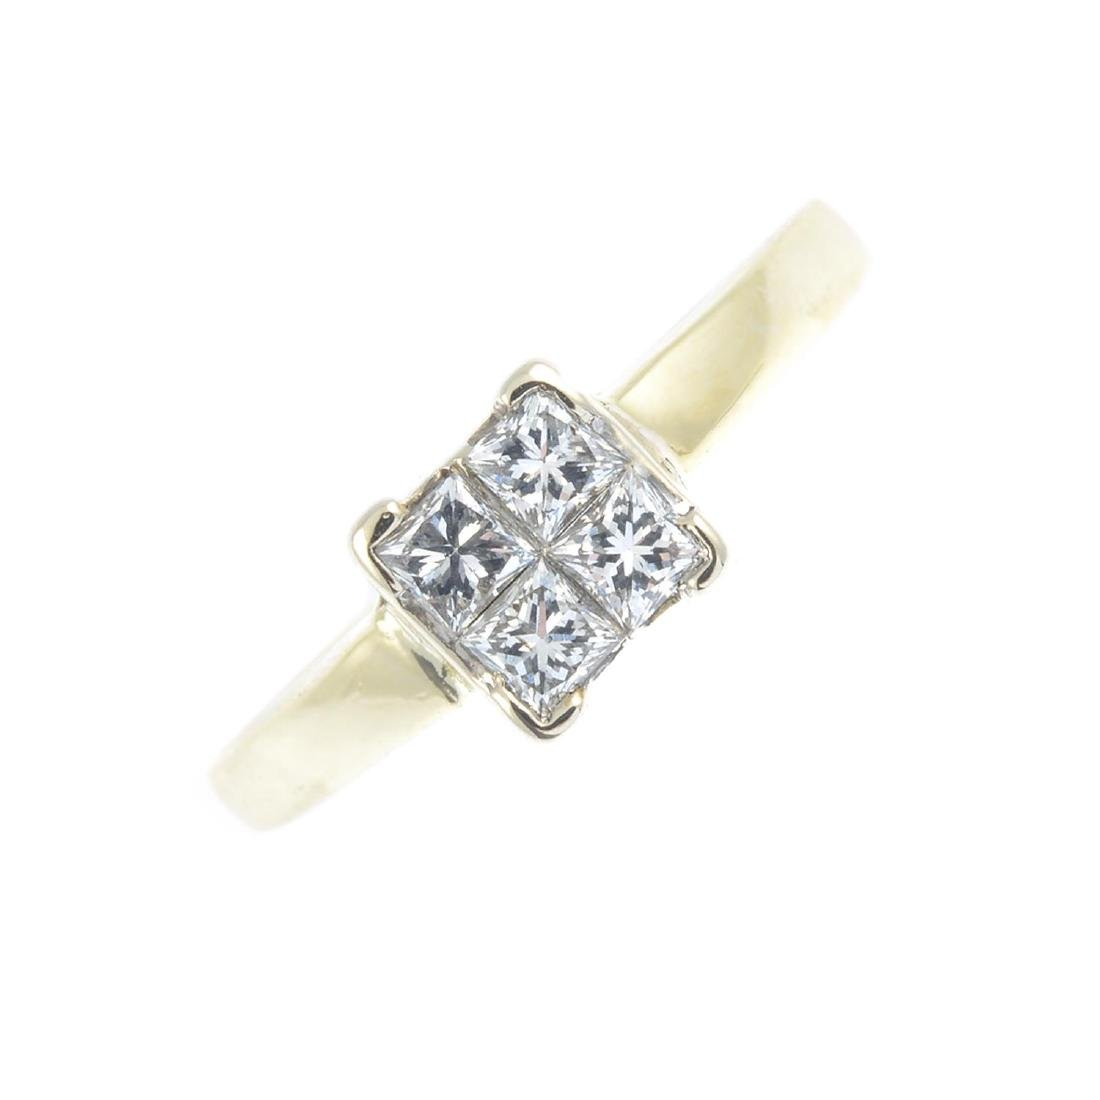 A diamond four-stone ring. The square-shape diamond